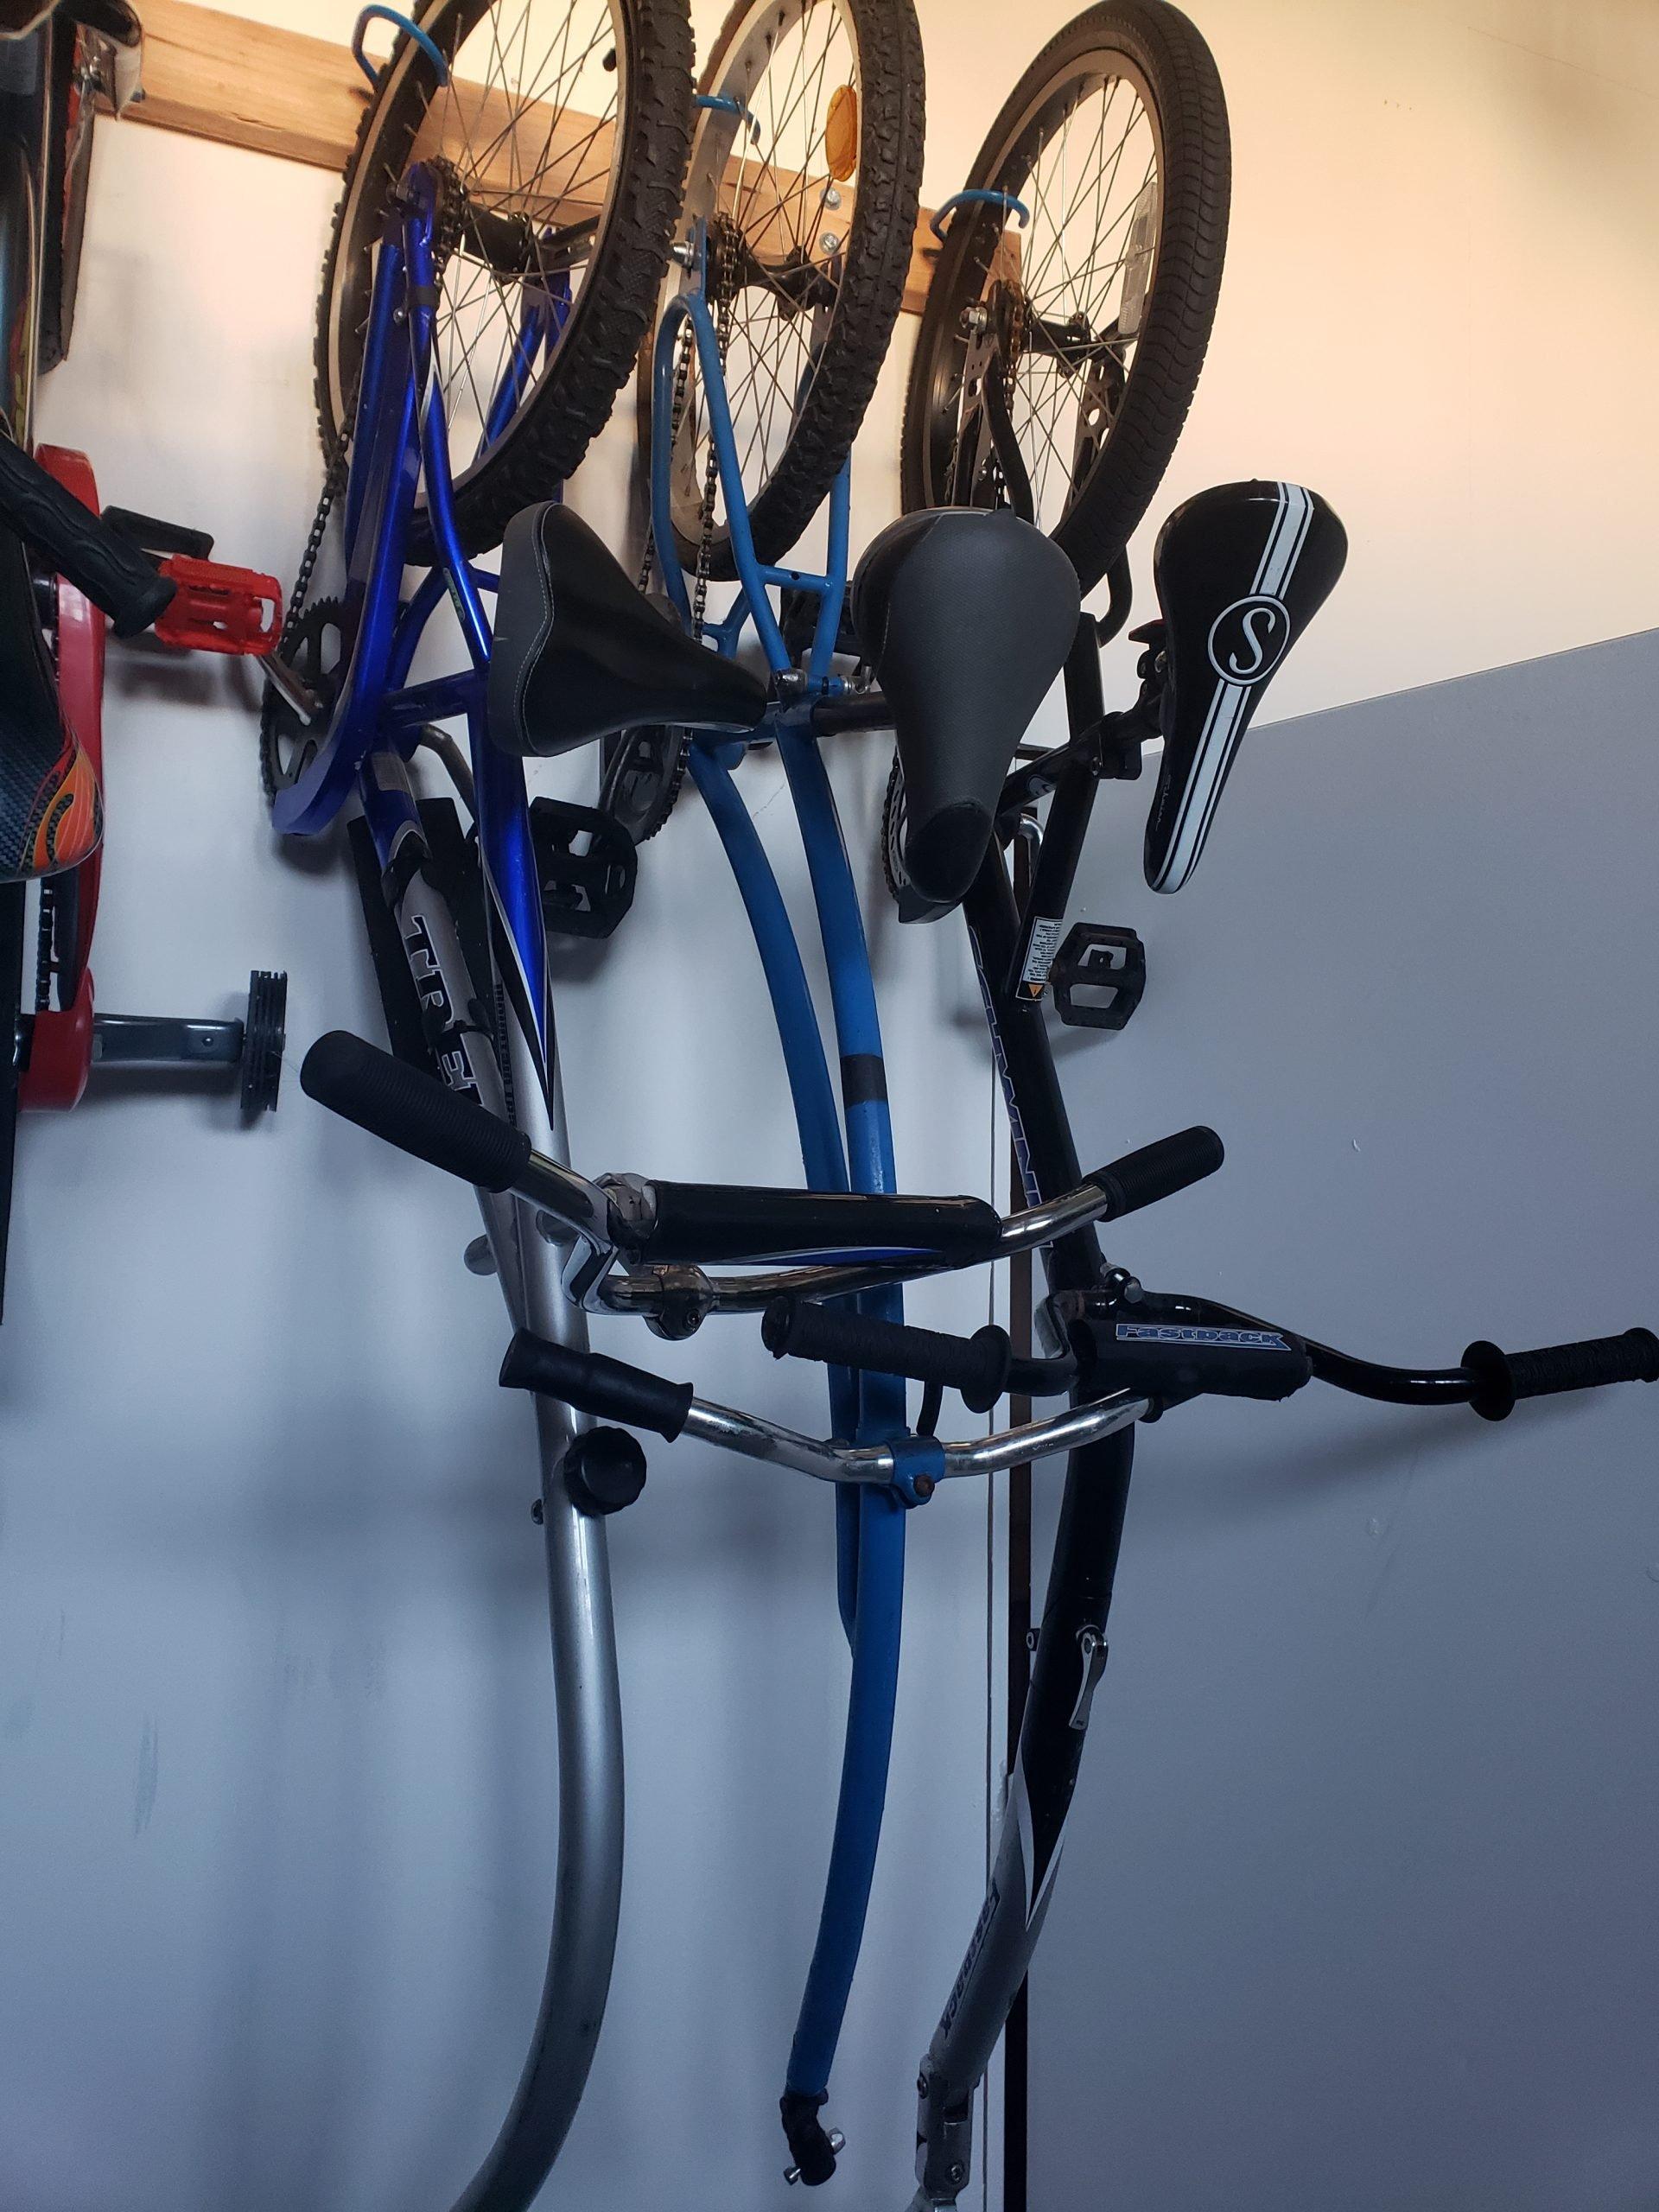 three one-wheeled bike attachments